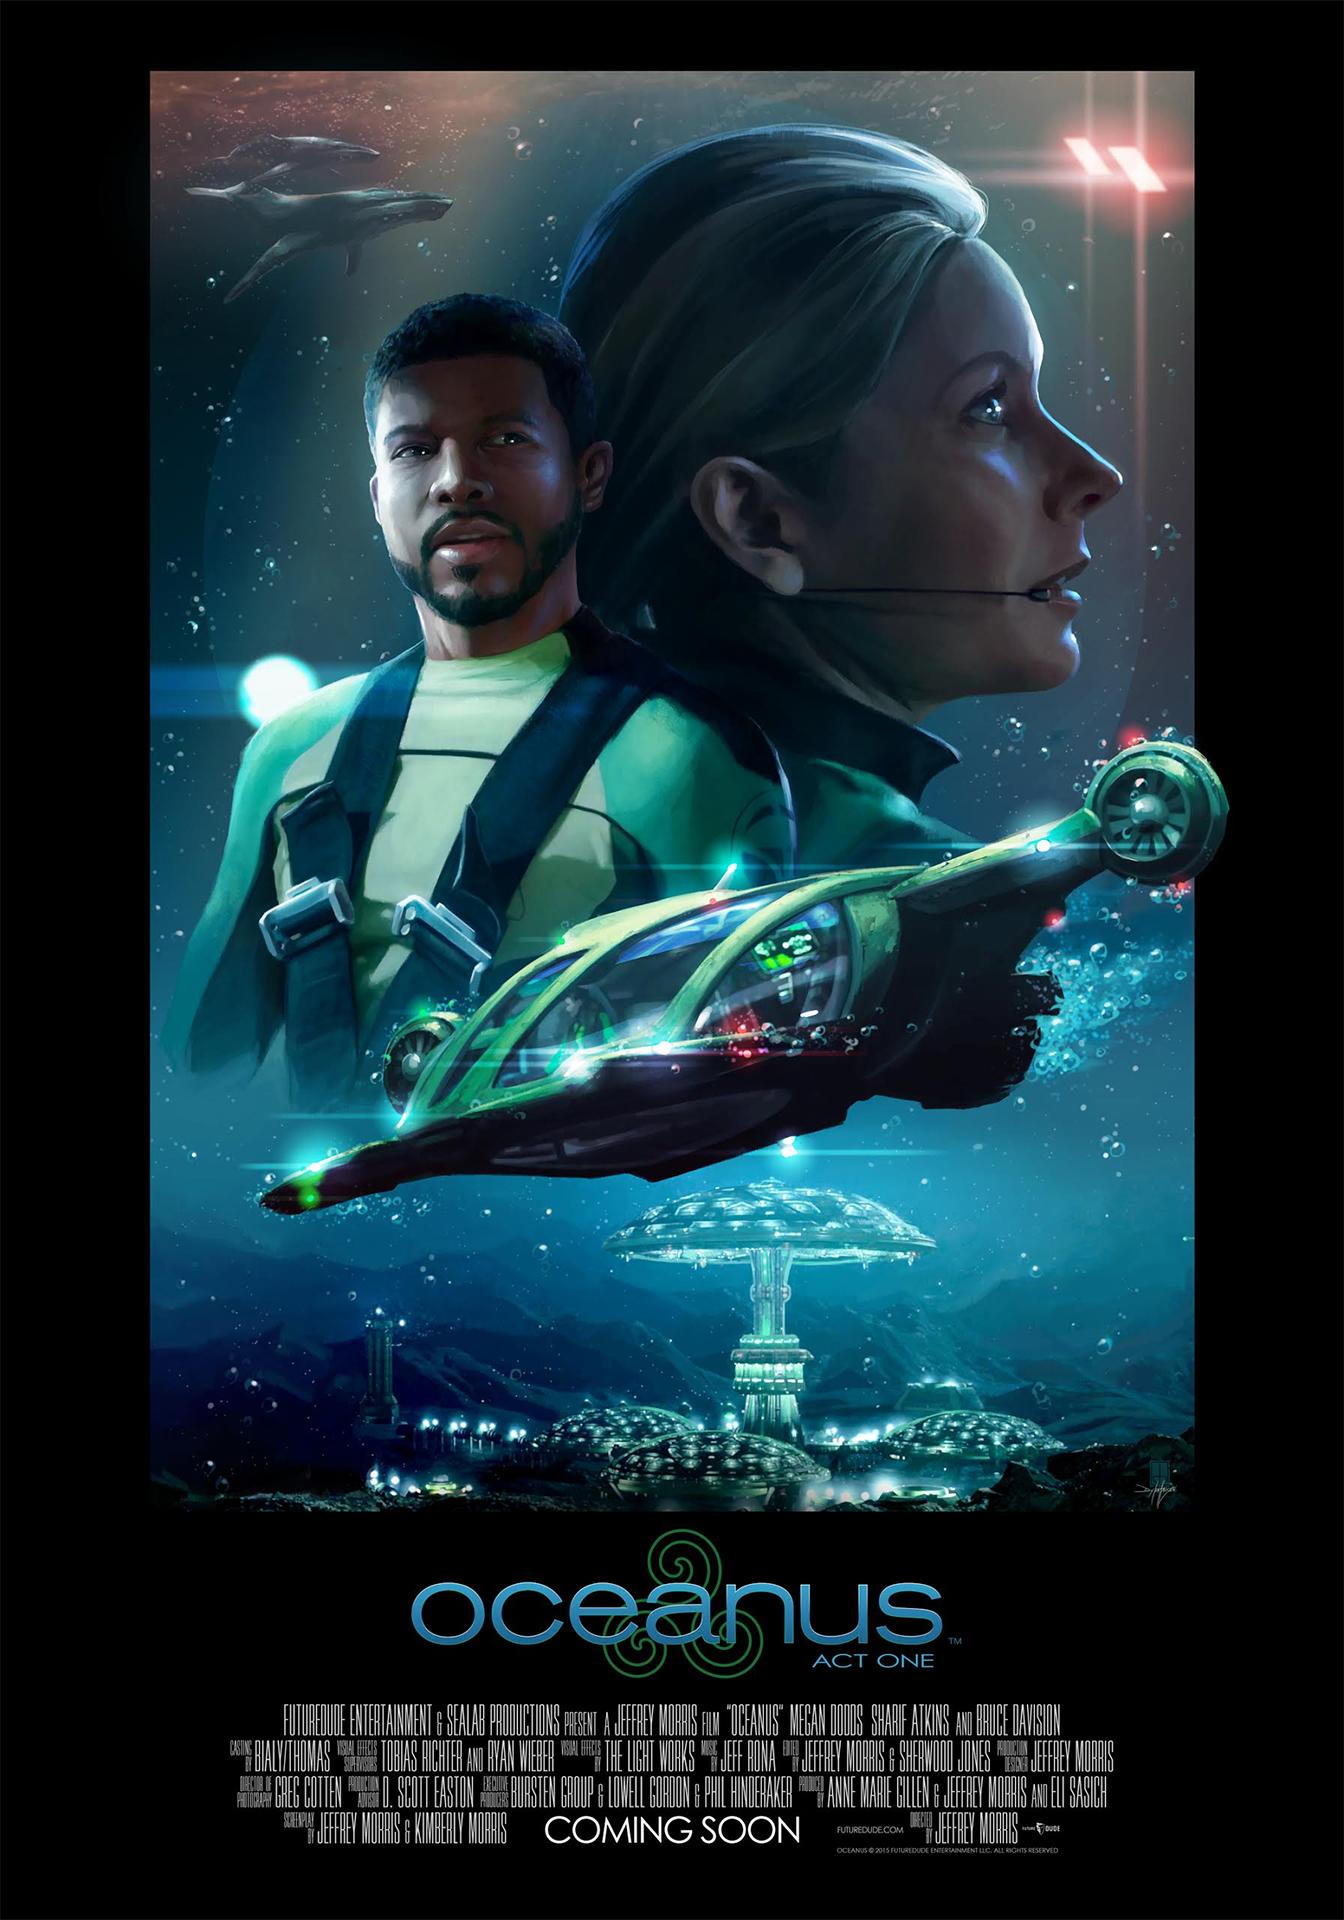 Movie poster for FutureDude Entertainment's upcoming film,  Oceanus: The Motion Picture